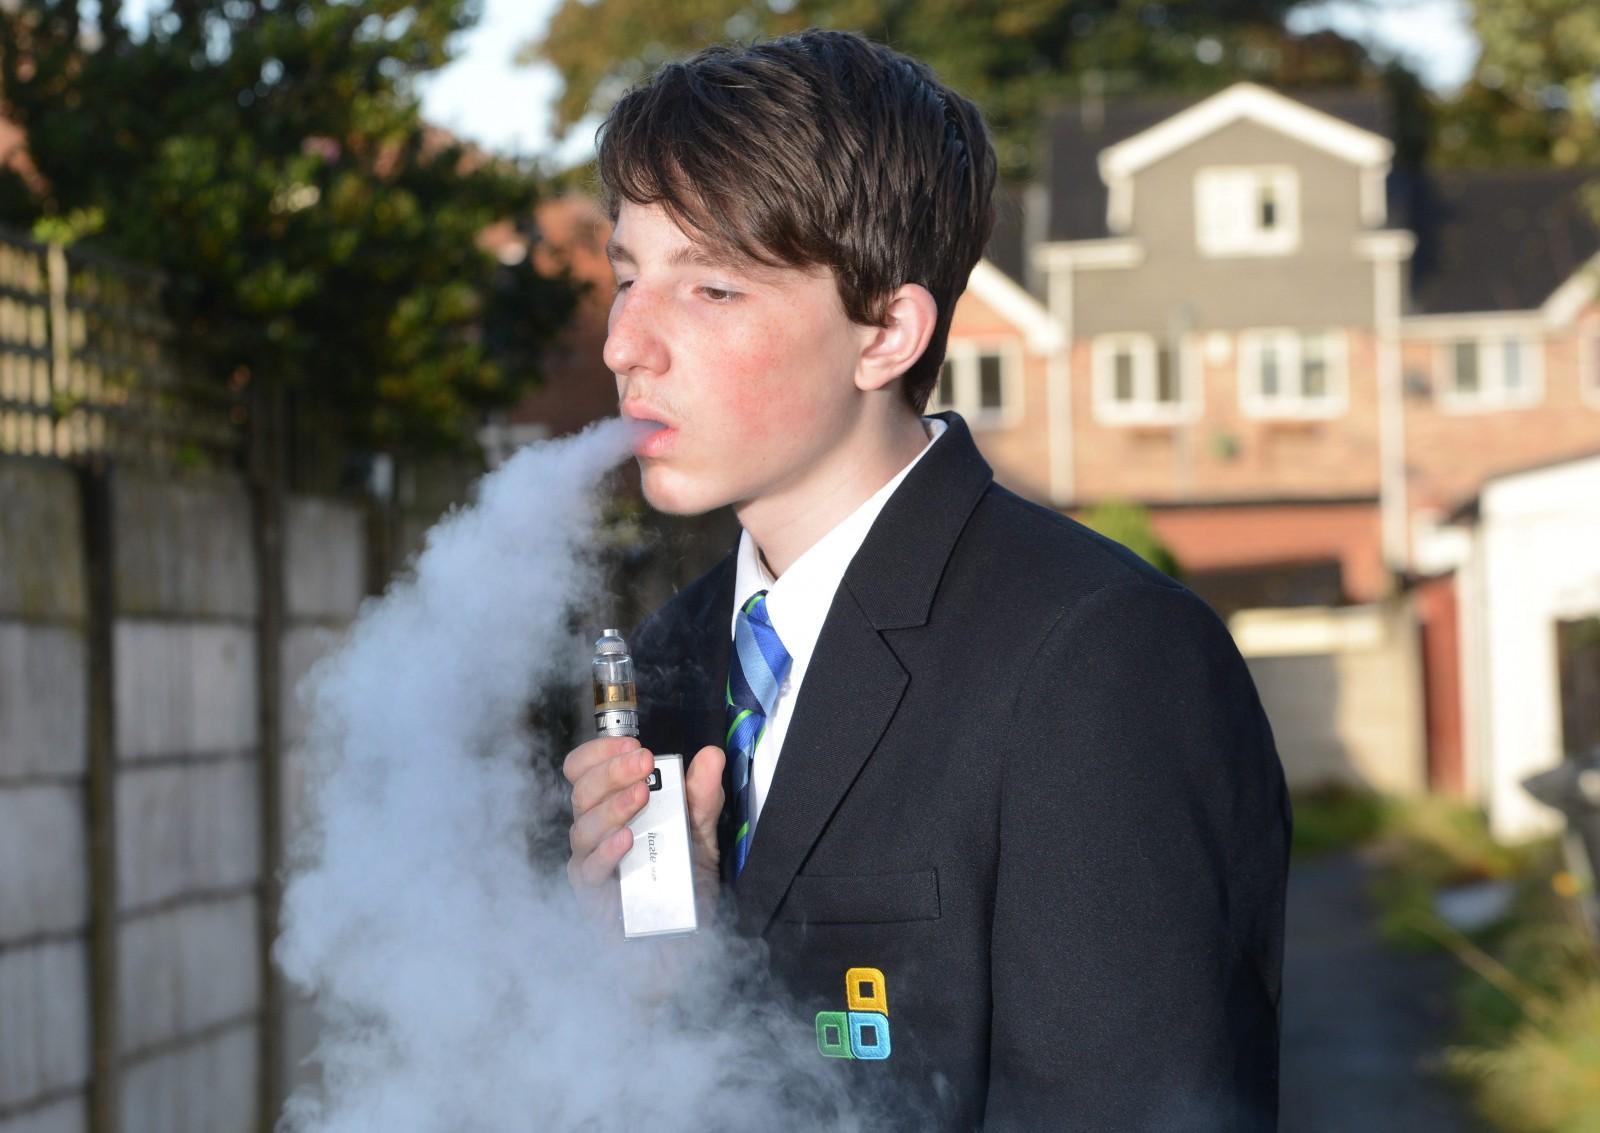 Mum slams school for confiscating her son's e-cigarette